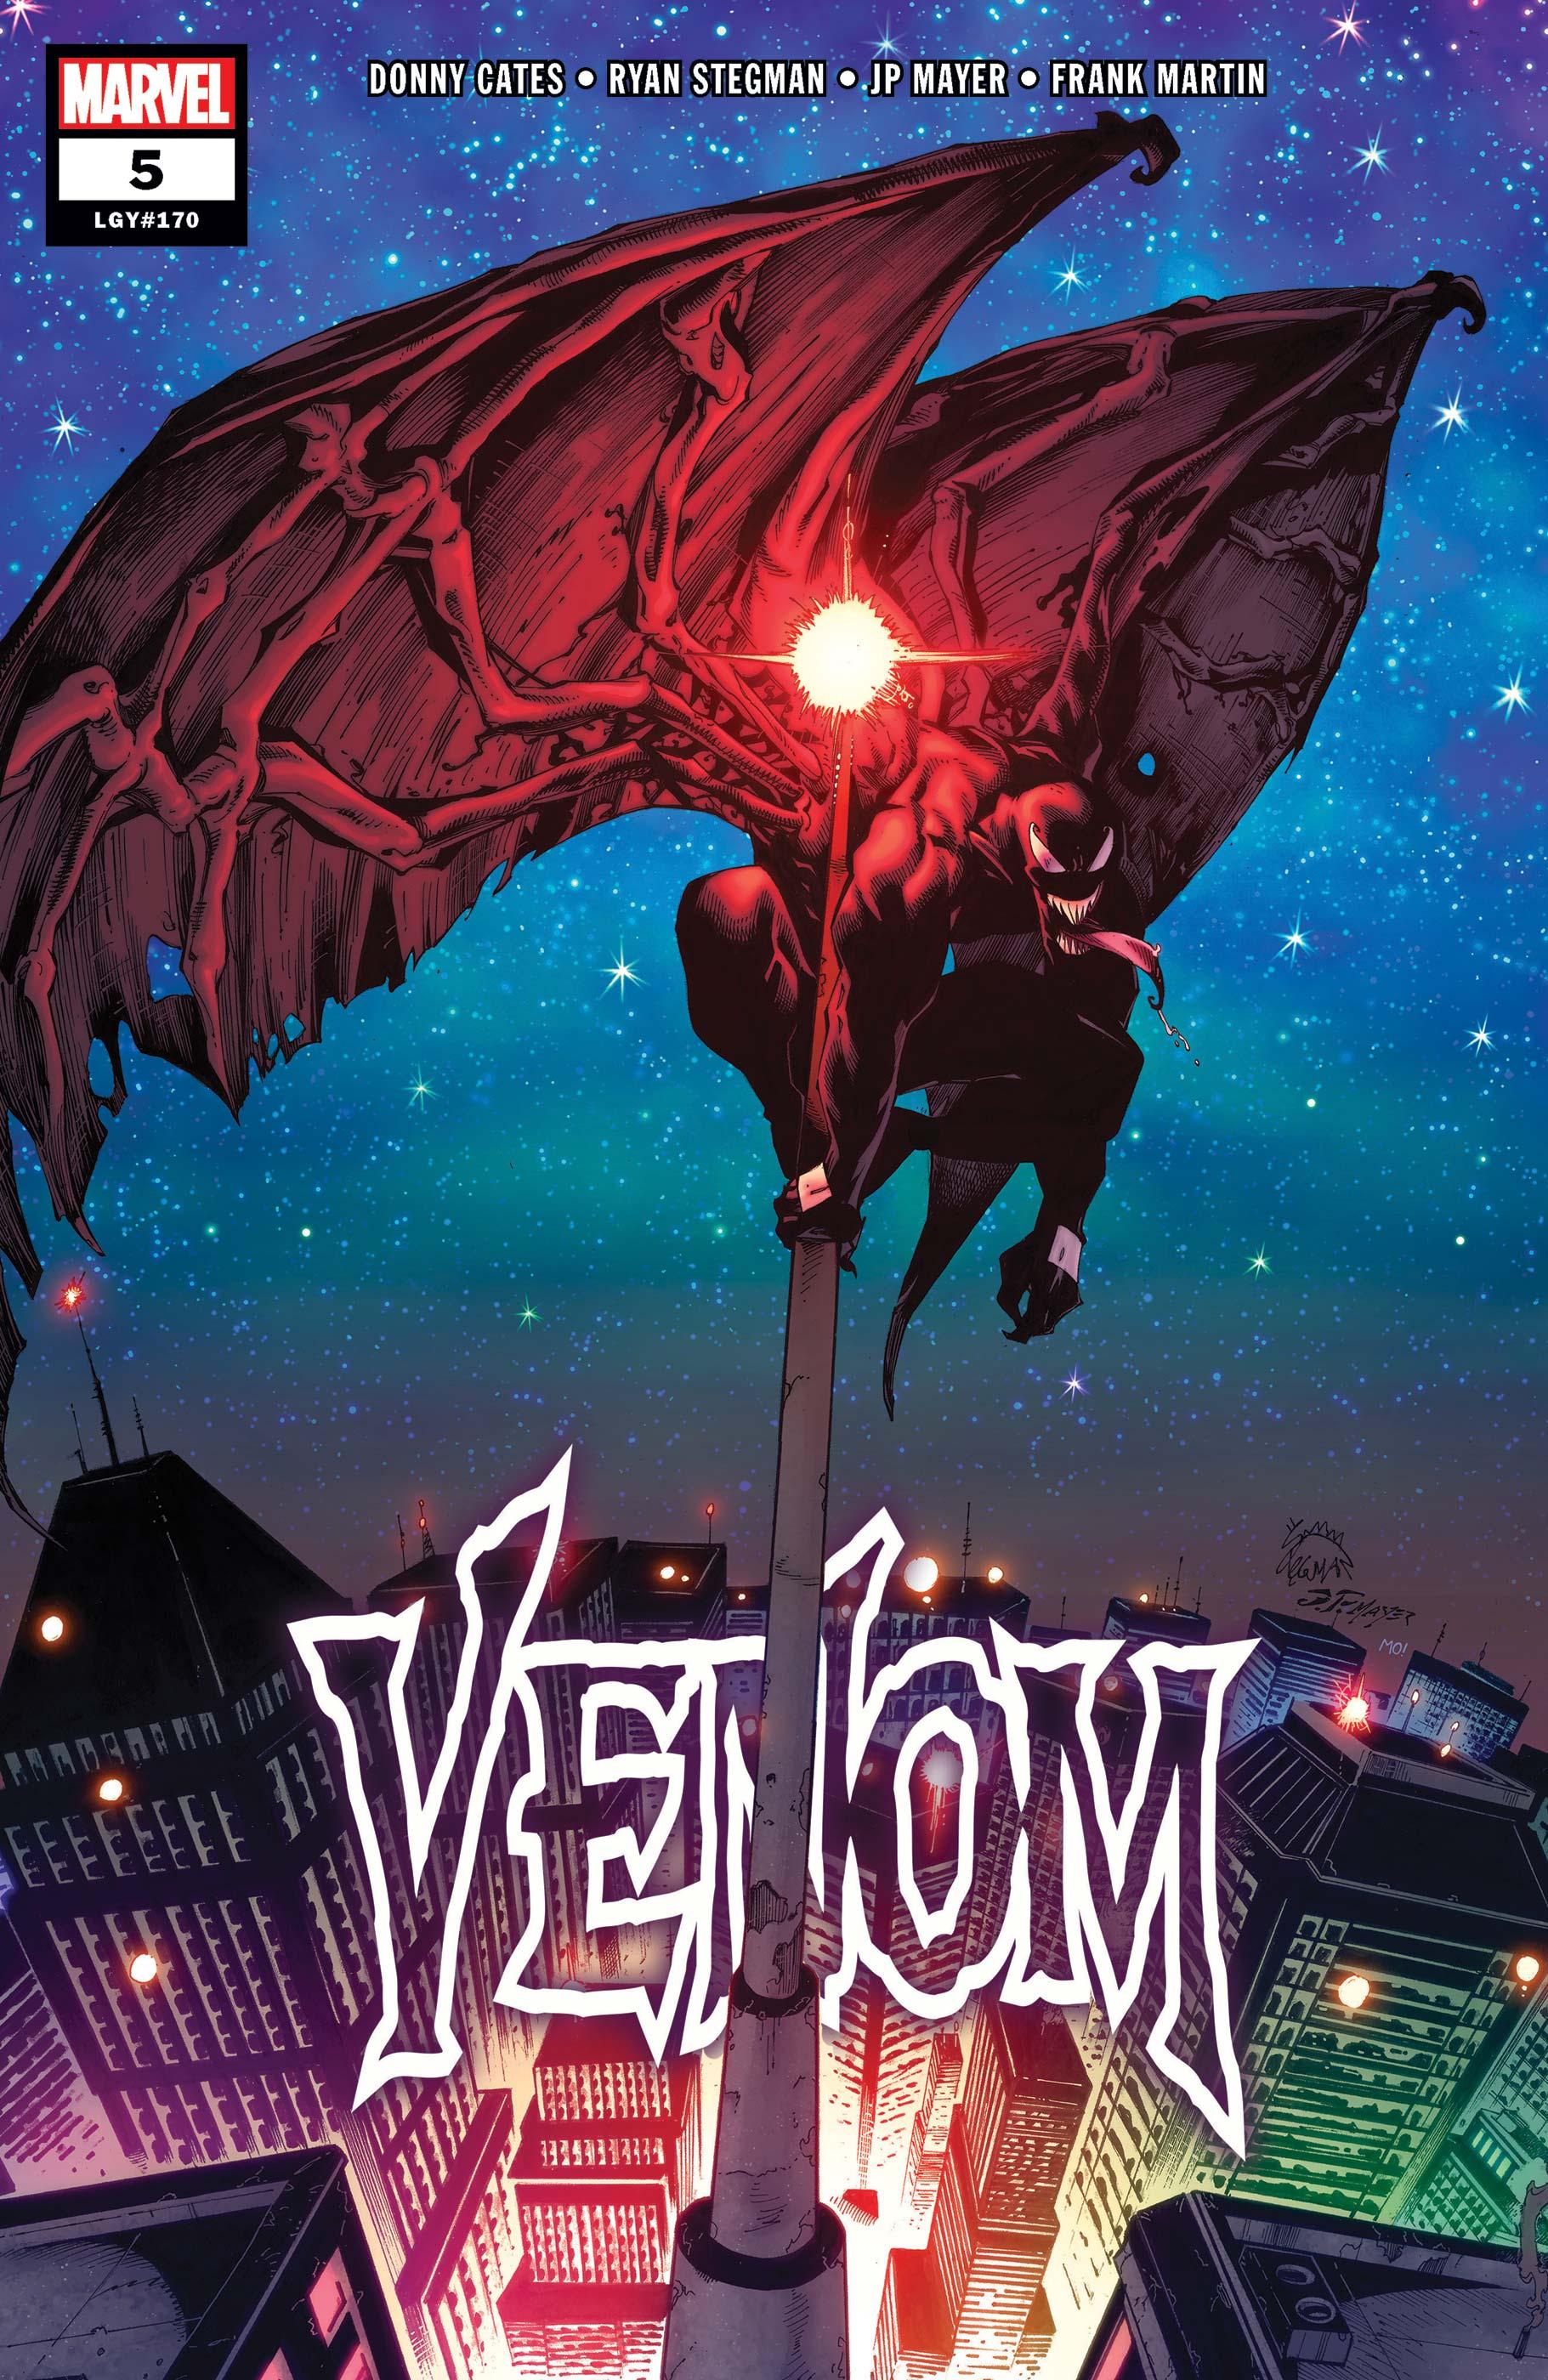 Venom (2018) #5